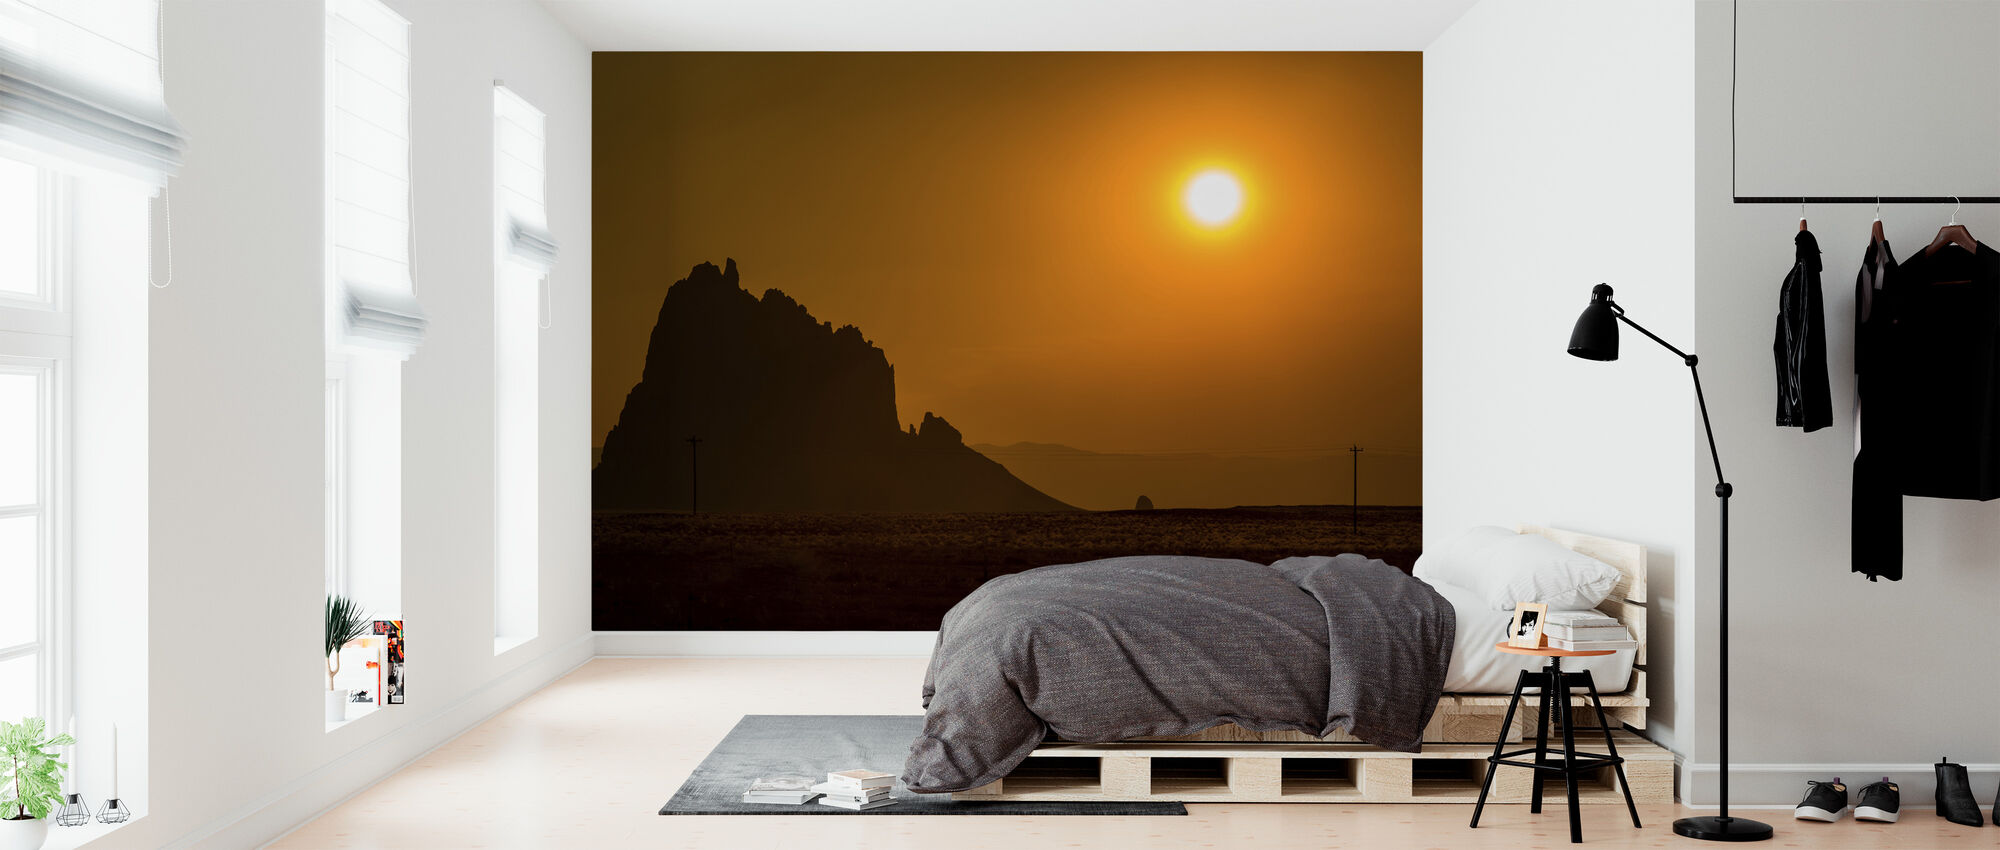 Shiprock at Sunset - Wallpaper - Bedroom